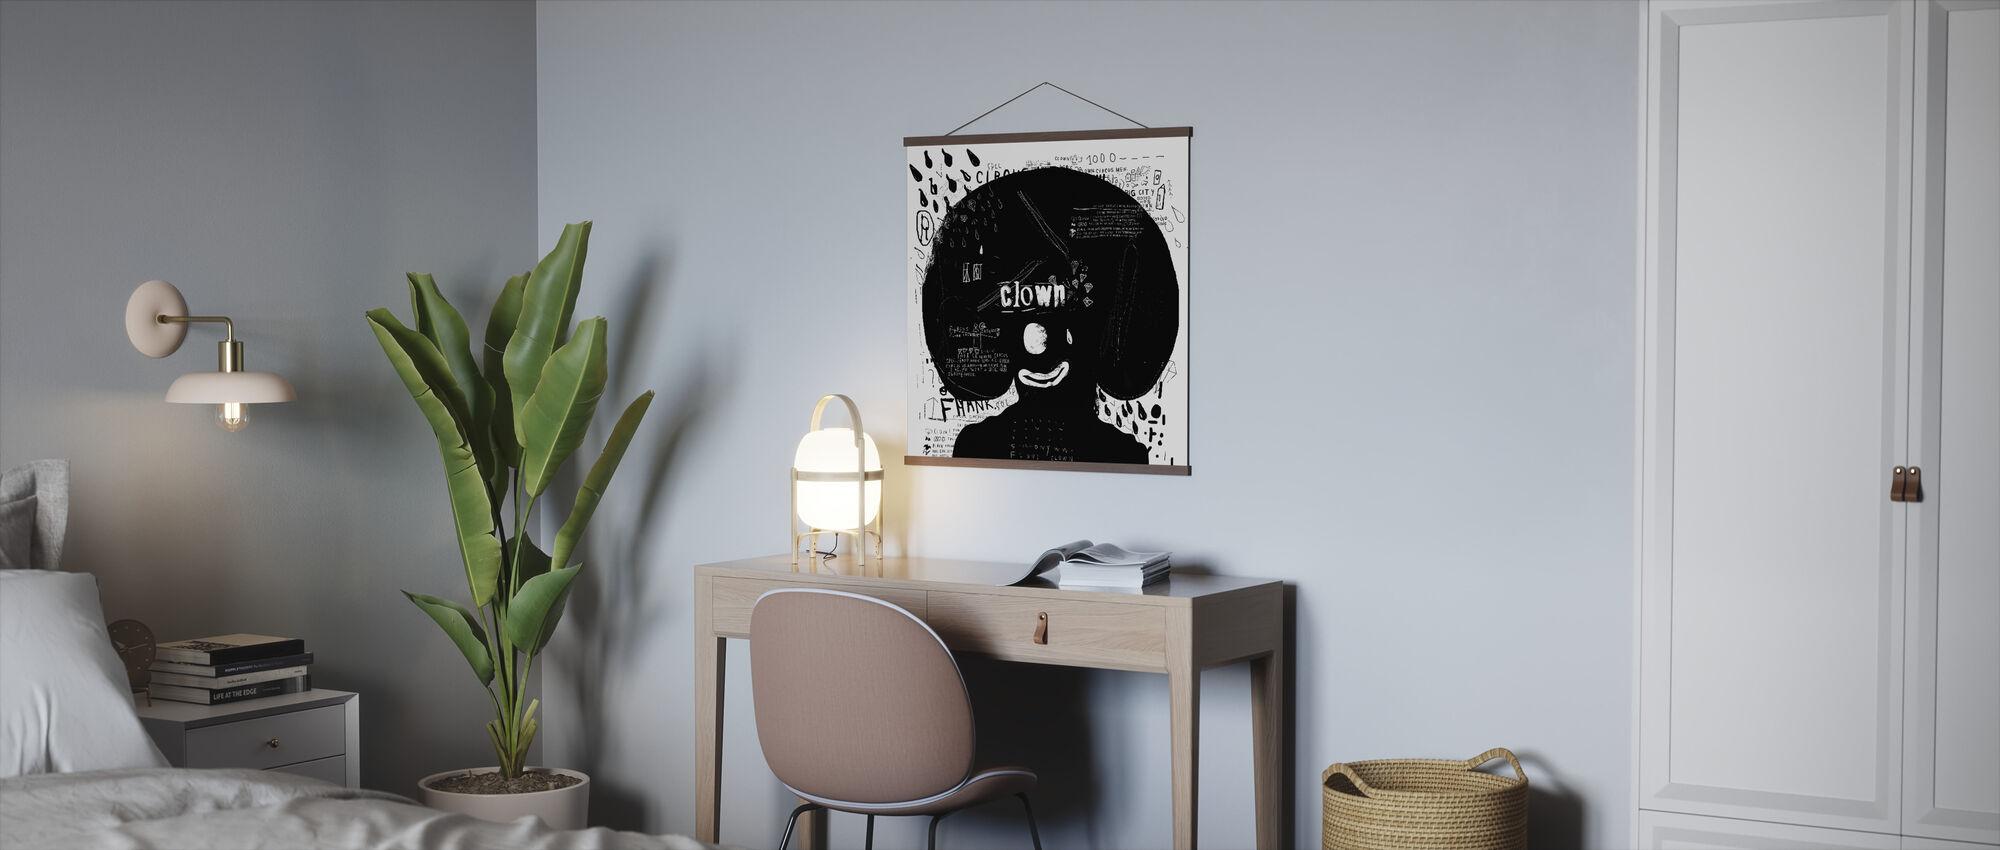 Clown - Poster - Office